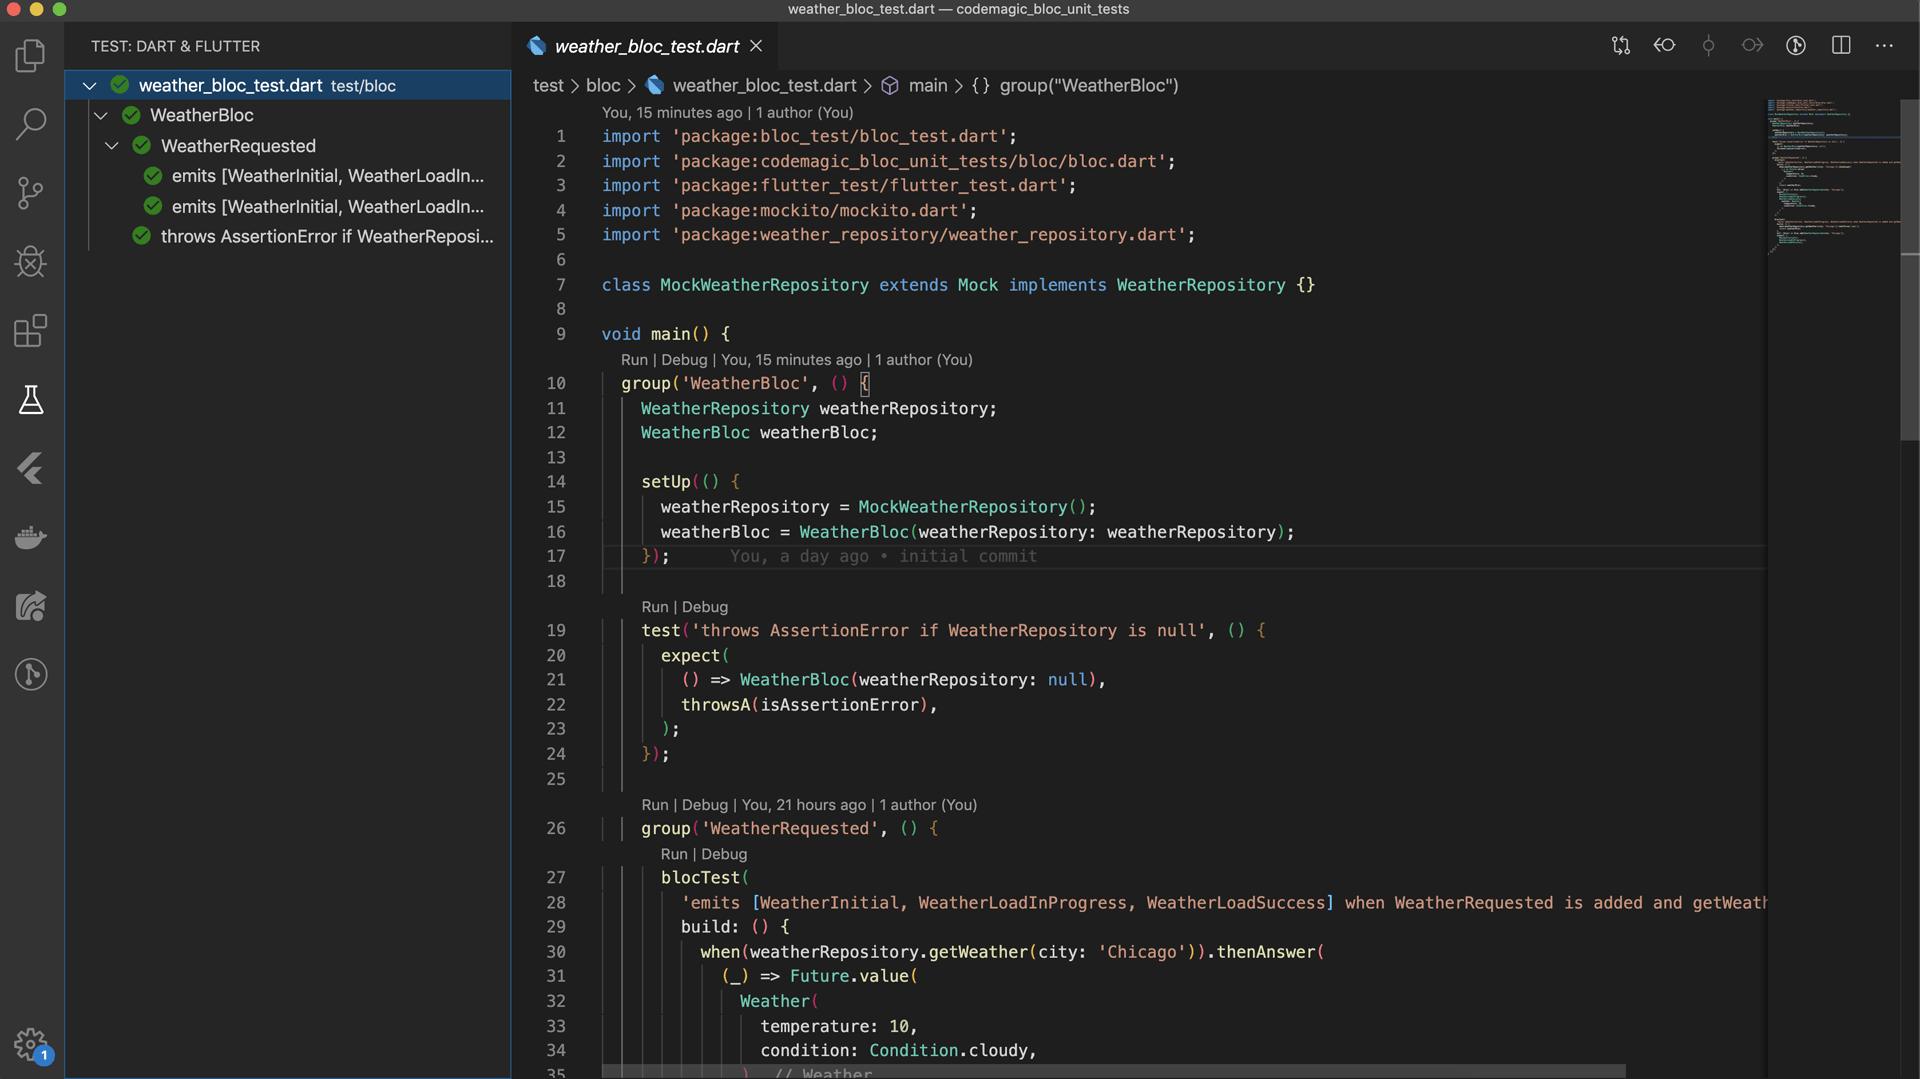 VS Code tests